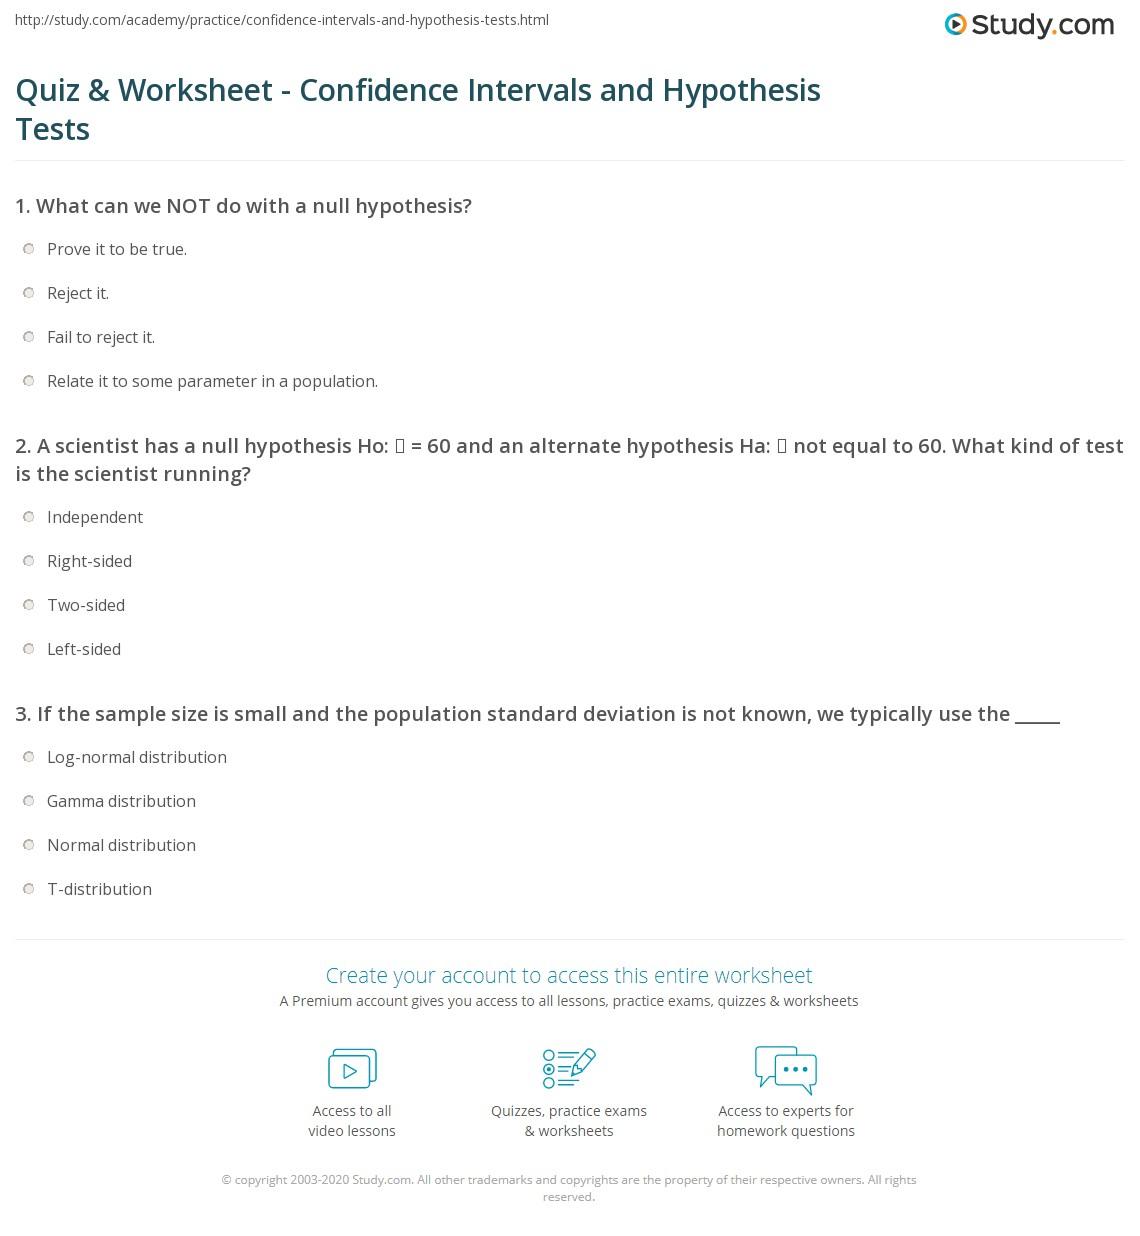 Worksheets Confidence Interval Worksheet quiz worksheet confidence intervals and hypothesis tests print the relationship between worksheet